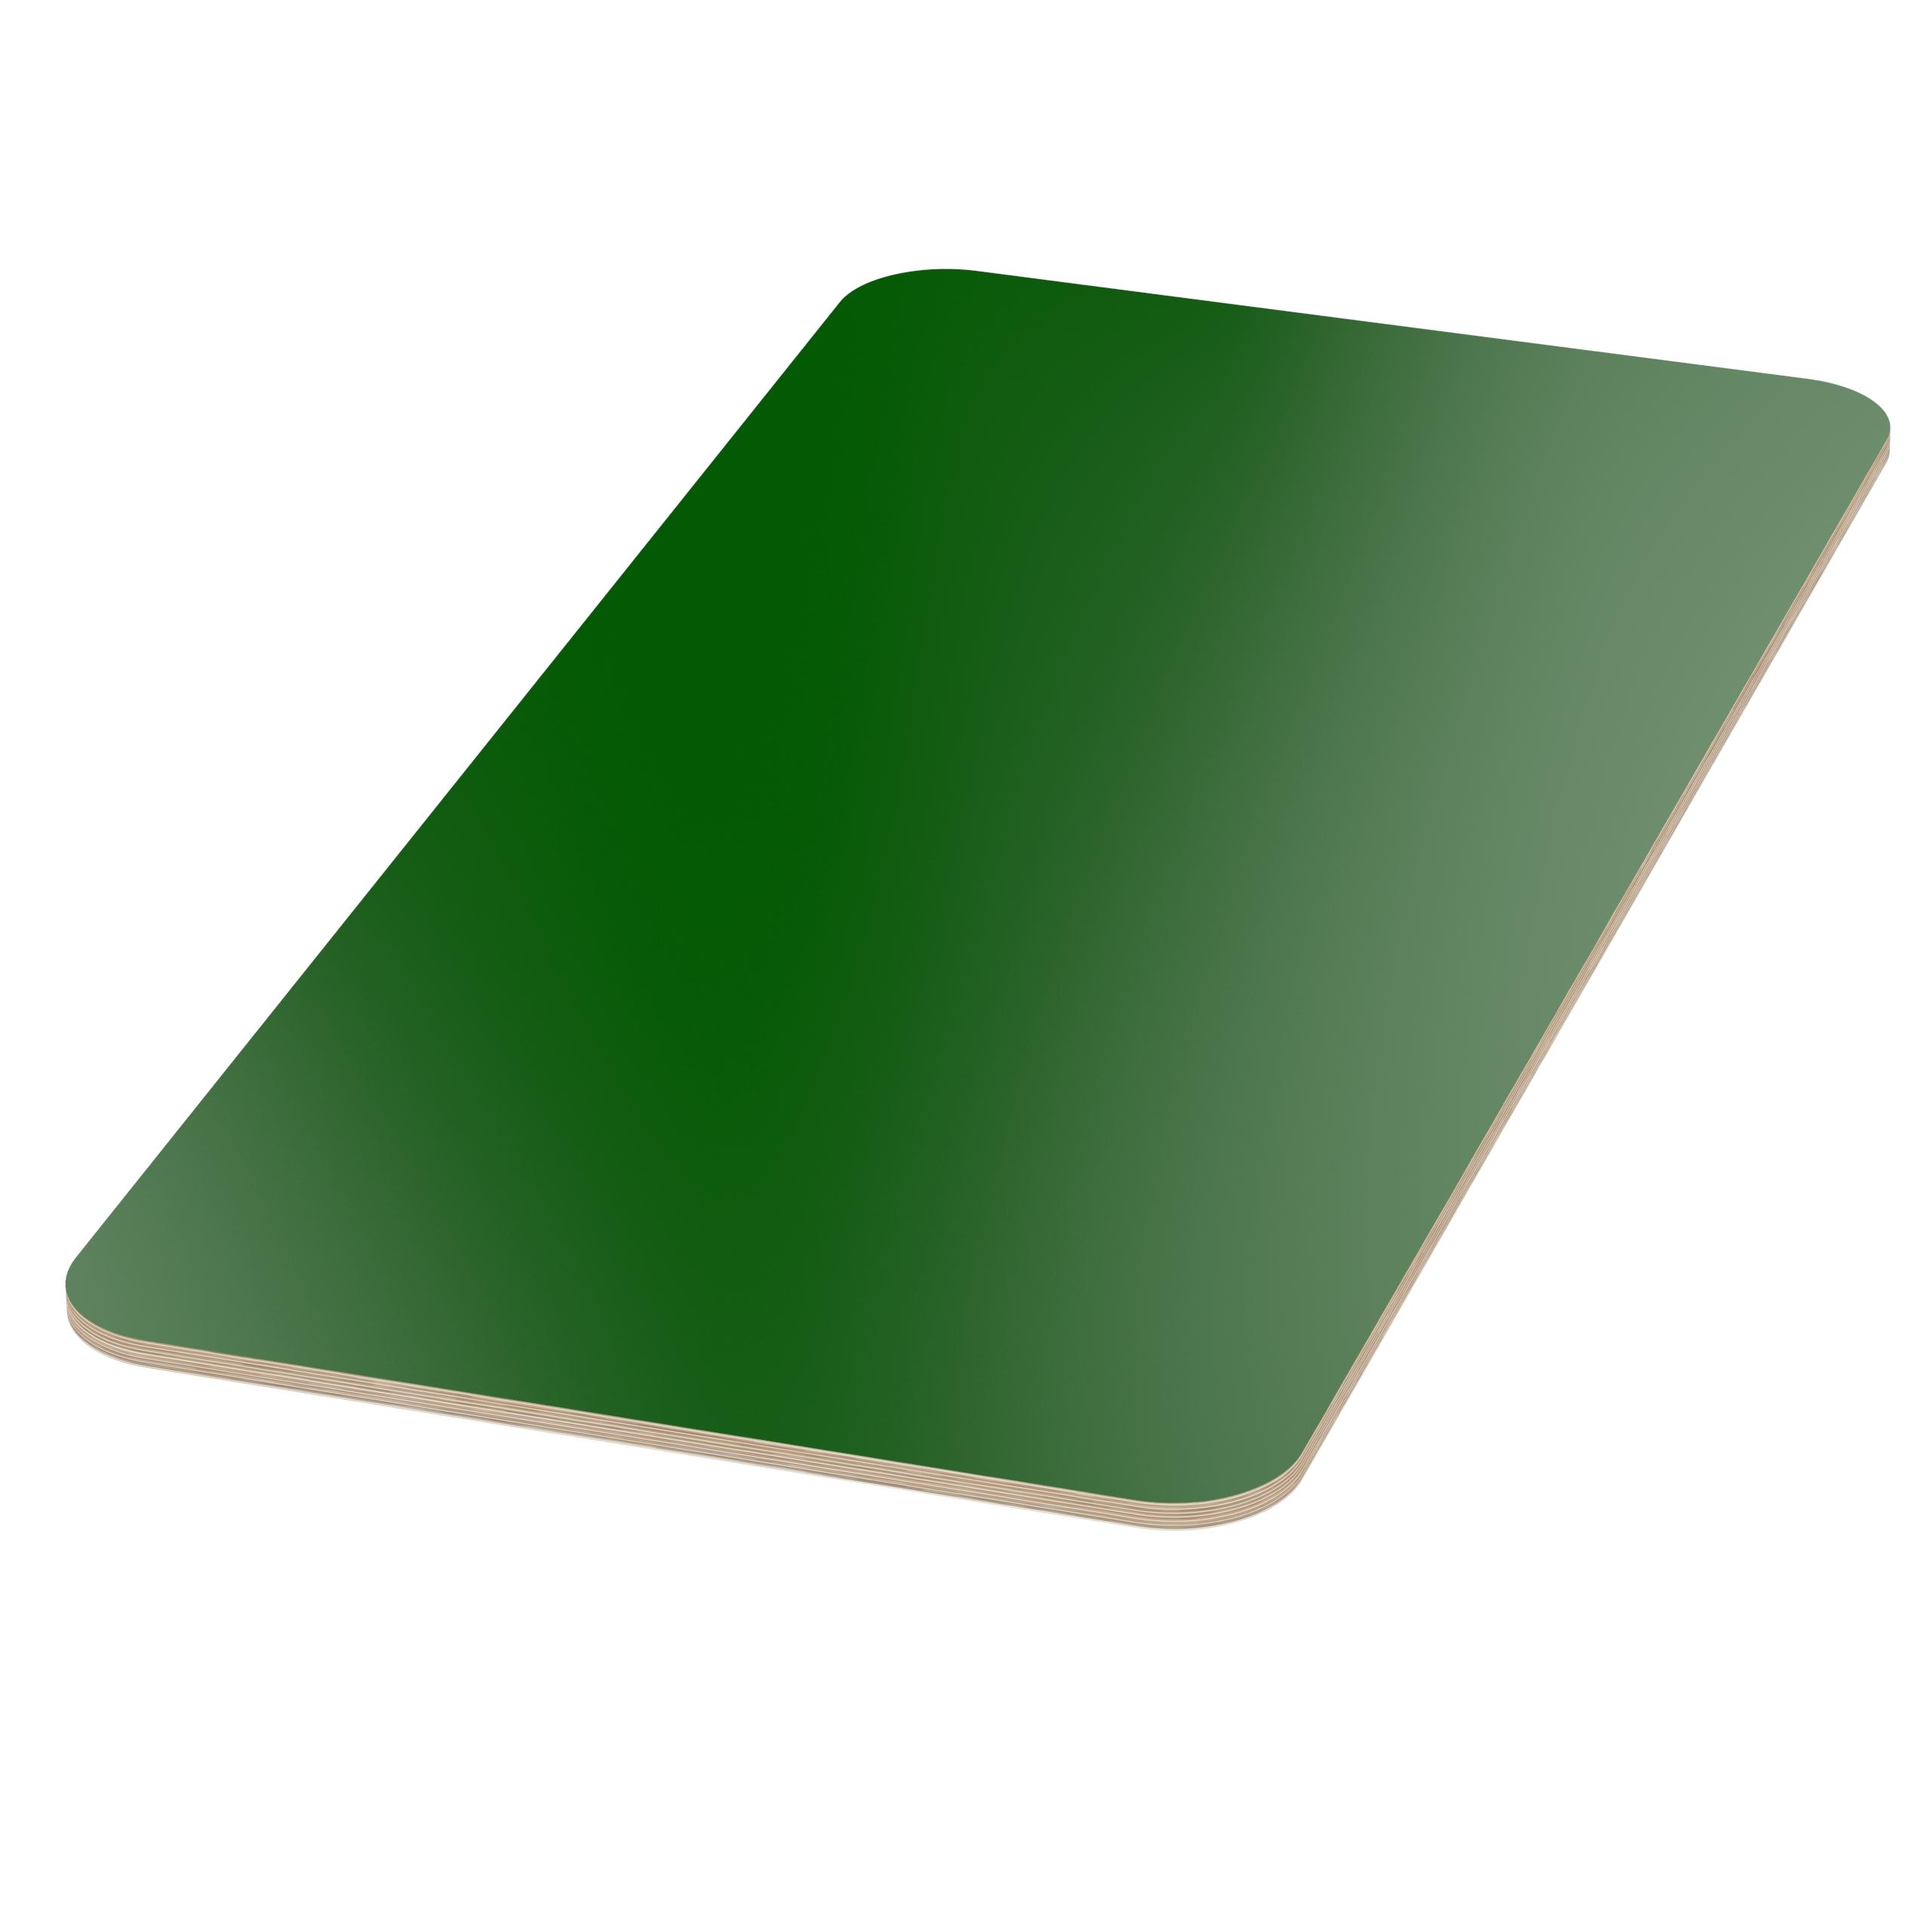 70x60 cm AUPROTEC Tischplatte 18mm wei/ß 700 mm x 600 mm rechteckige Multiplexplatte melaminbeschichtet von 40cm-200cm ausw/ählbar Ecken Radius 100mm Birken-Sperrholzplatten Auswahl